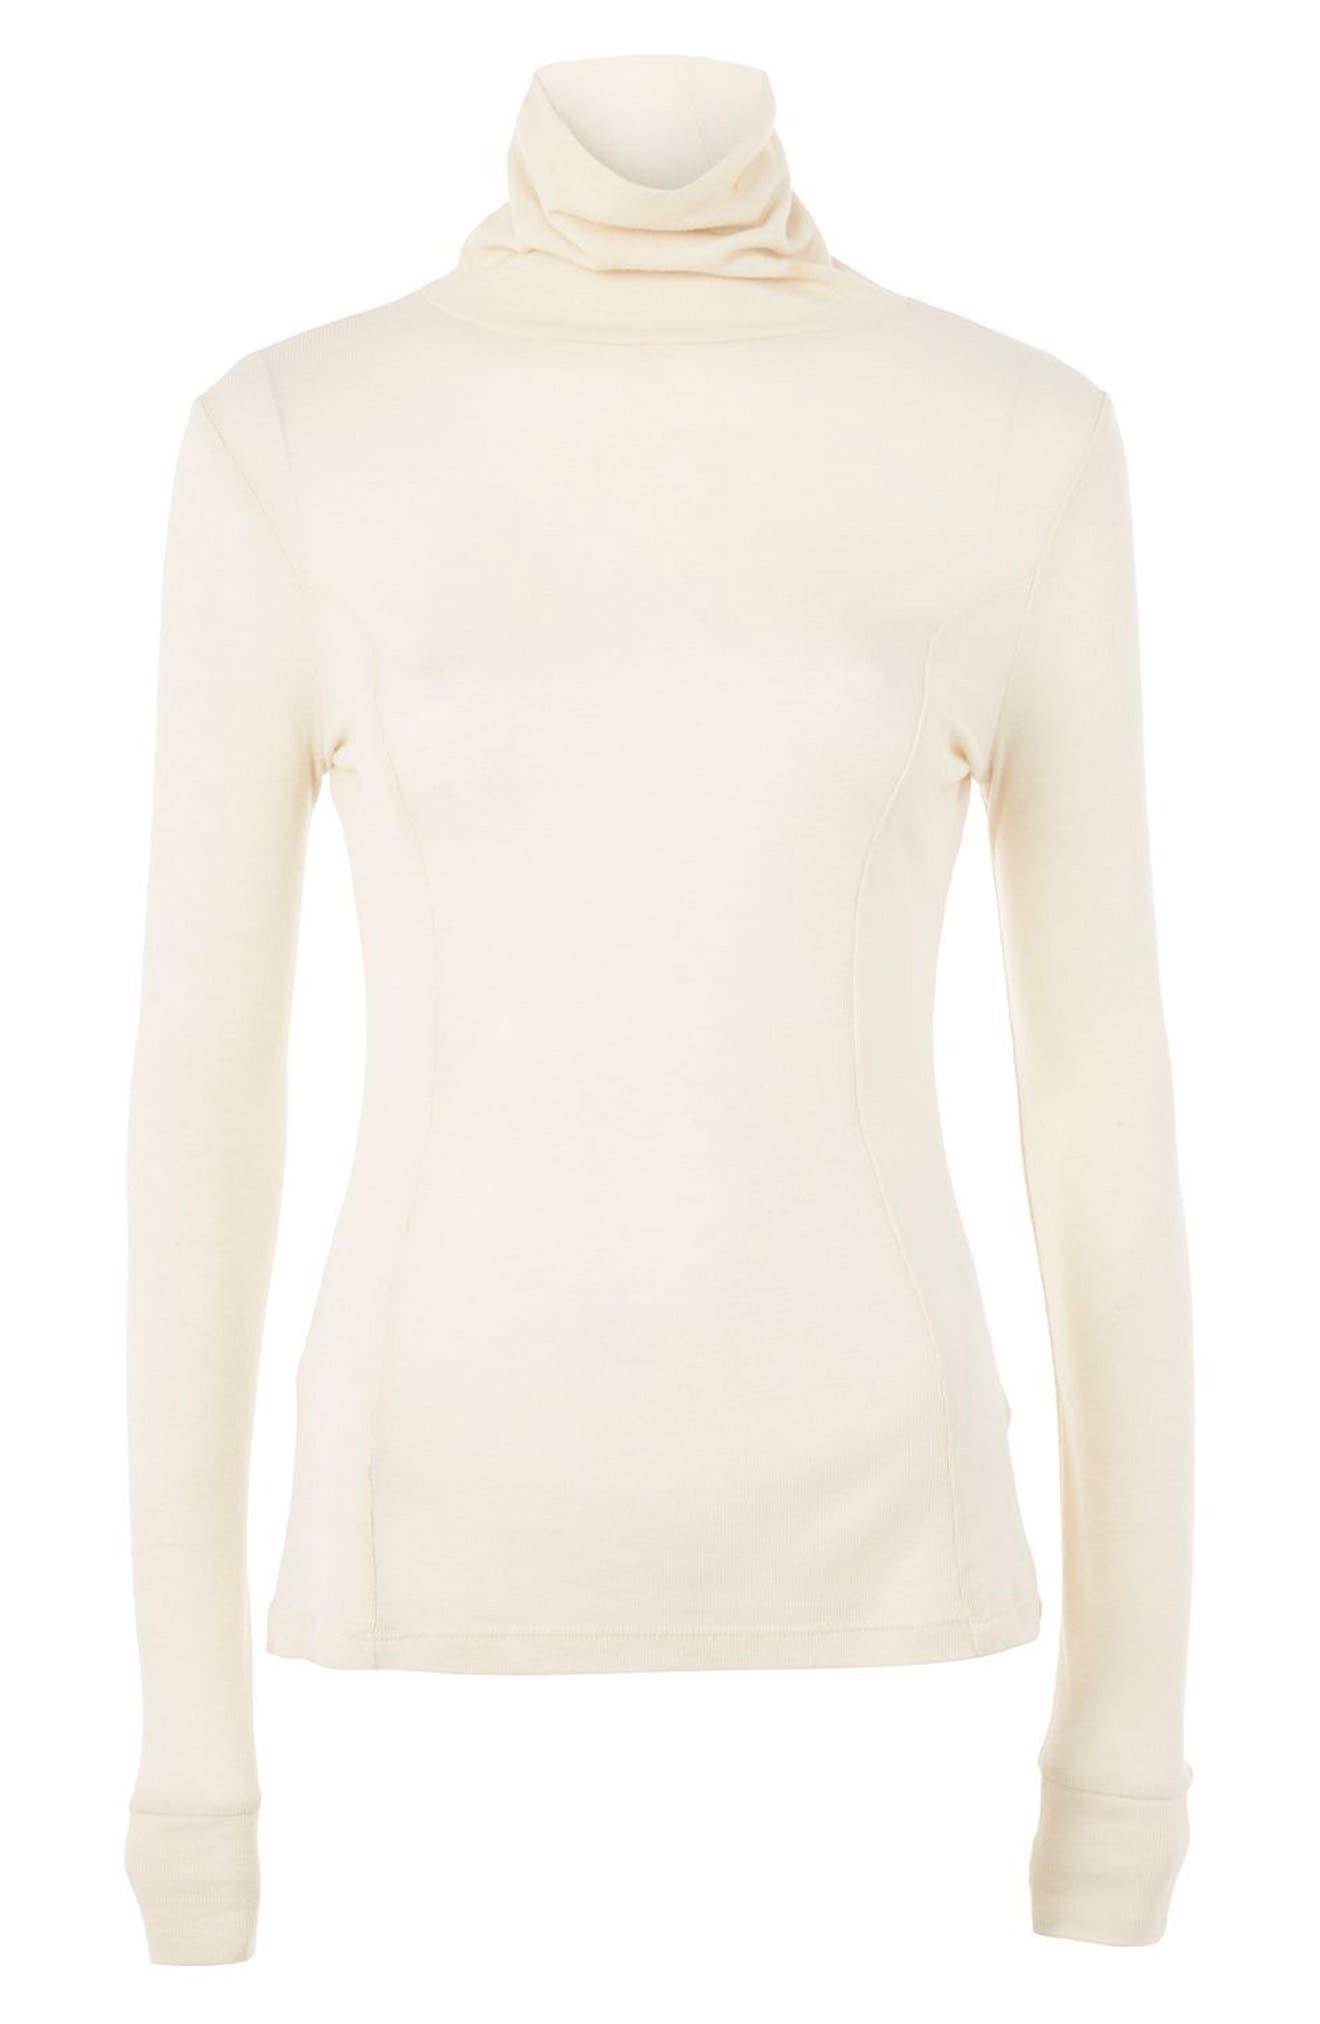 Main Image - Topshop Boutique Wool Turtleneck Sweater